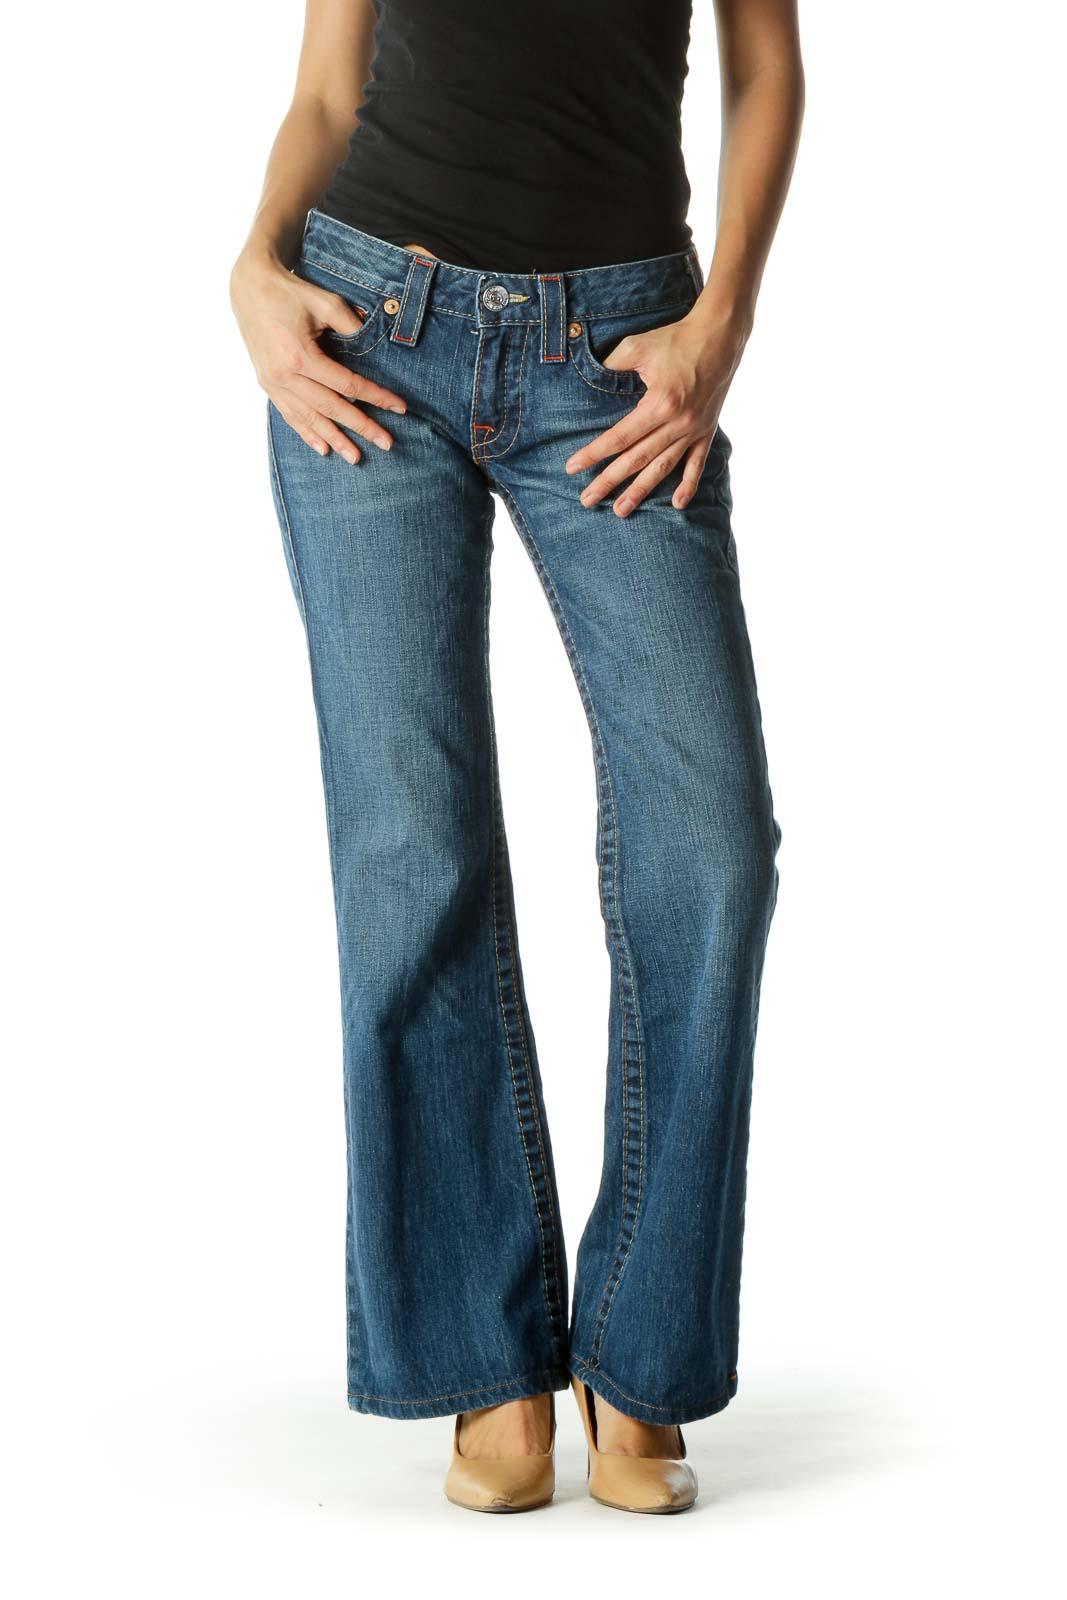 Blue Medium-Wash Stitched Flared Denim Jeans Front